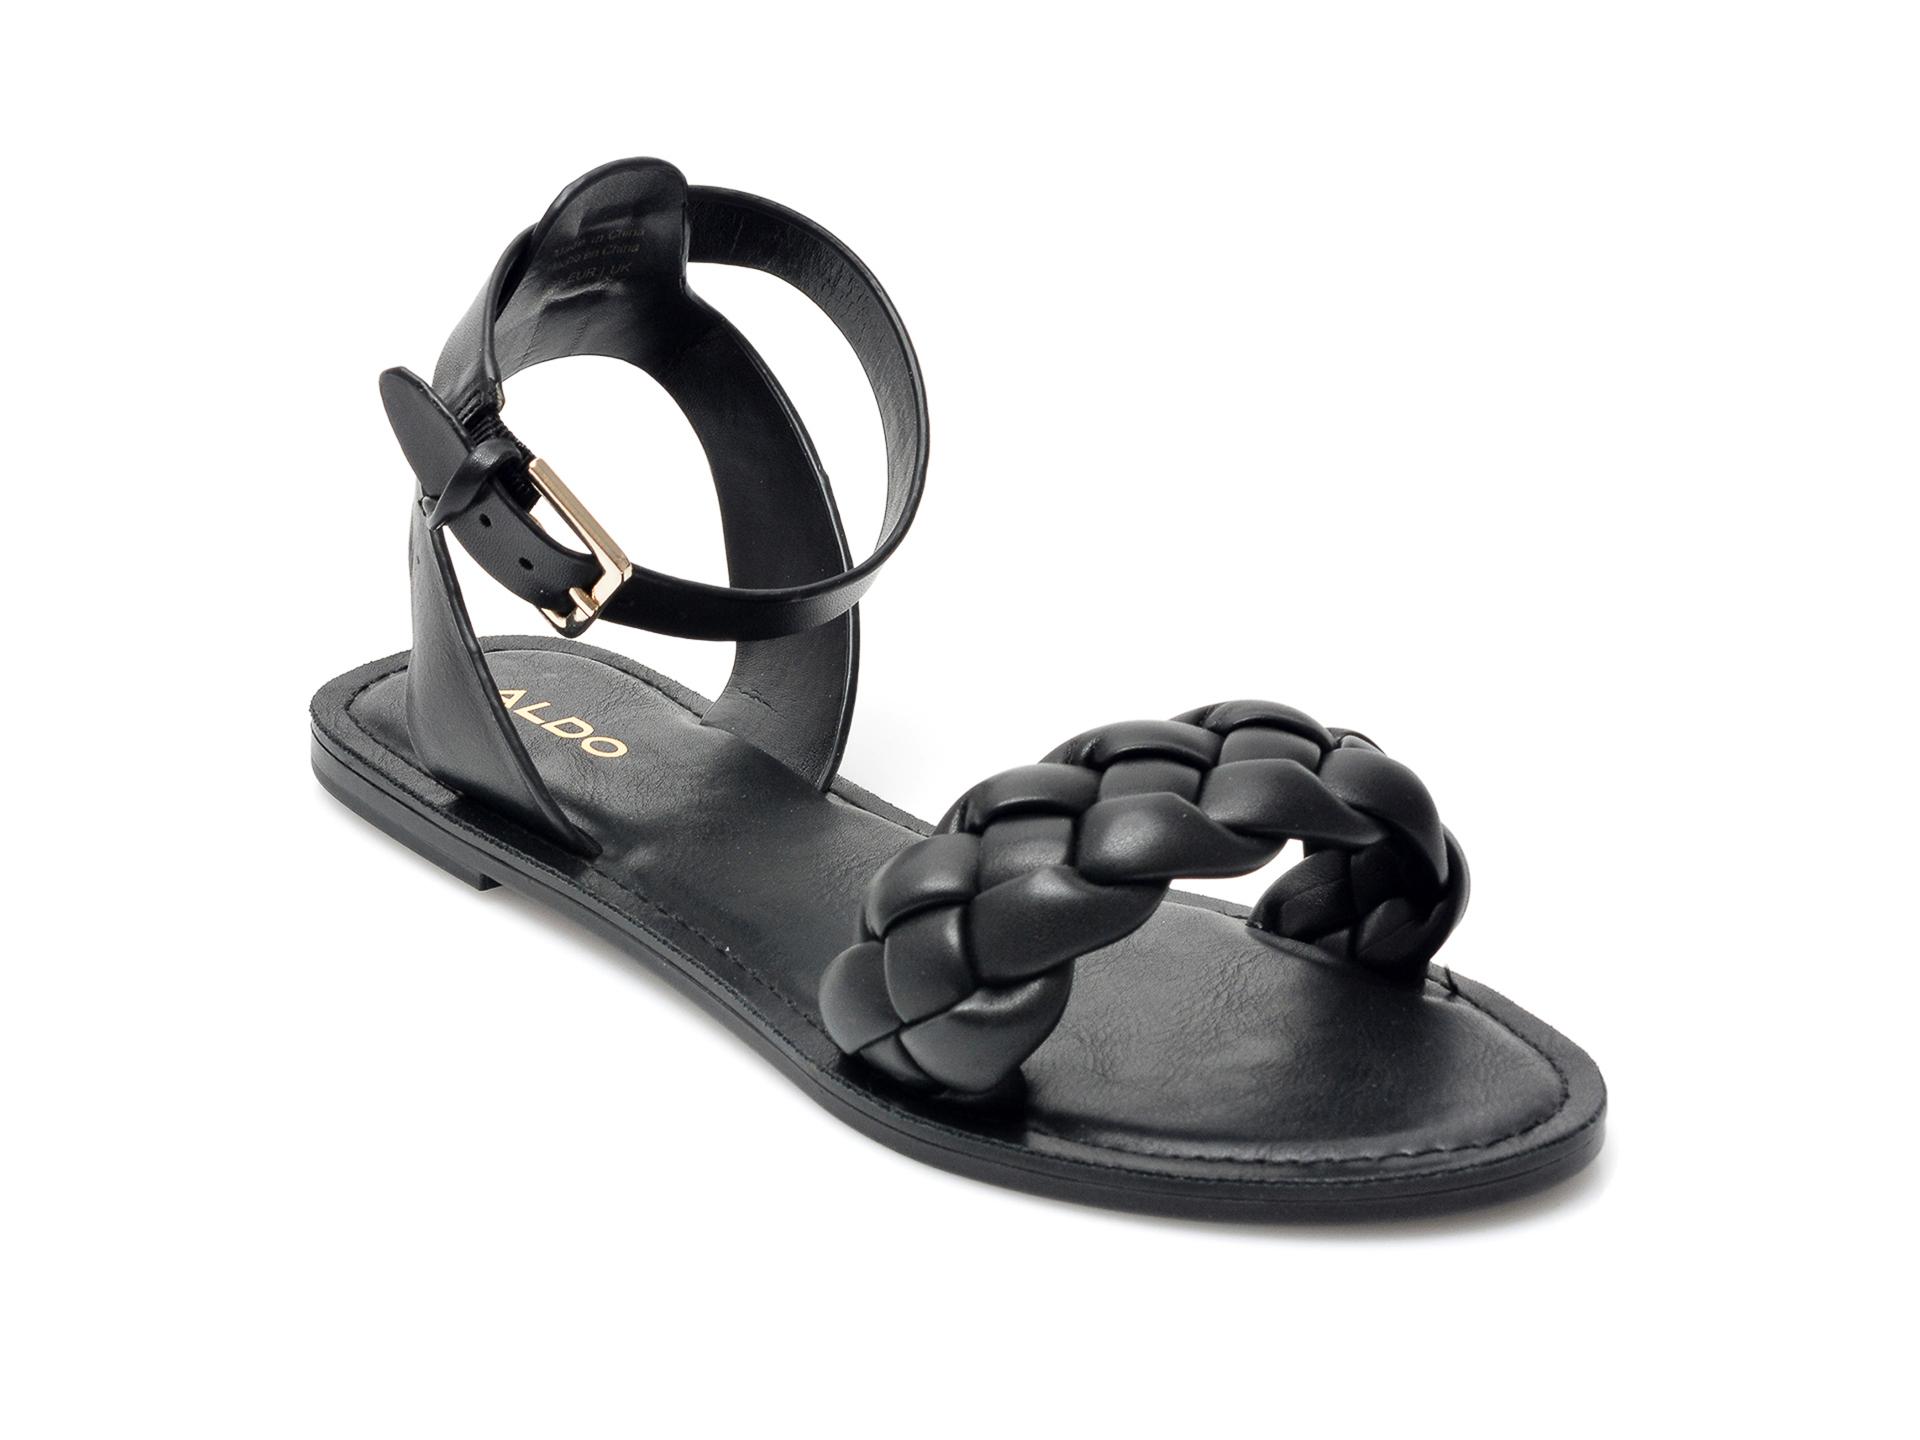 Sandale ALDO negre, 13190674, din piele naturala imagine otter.ro